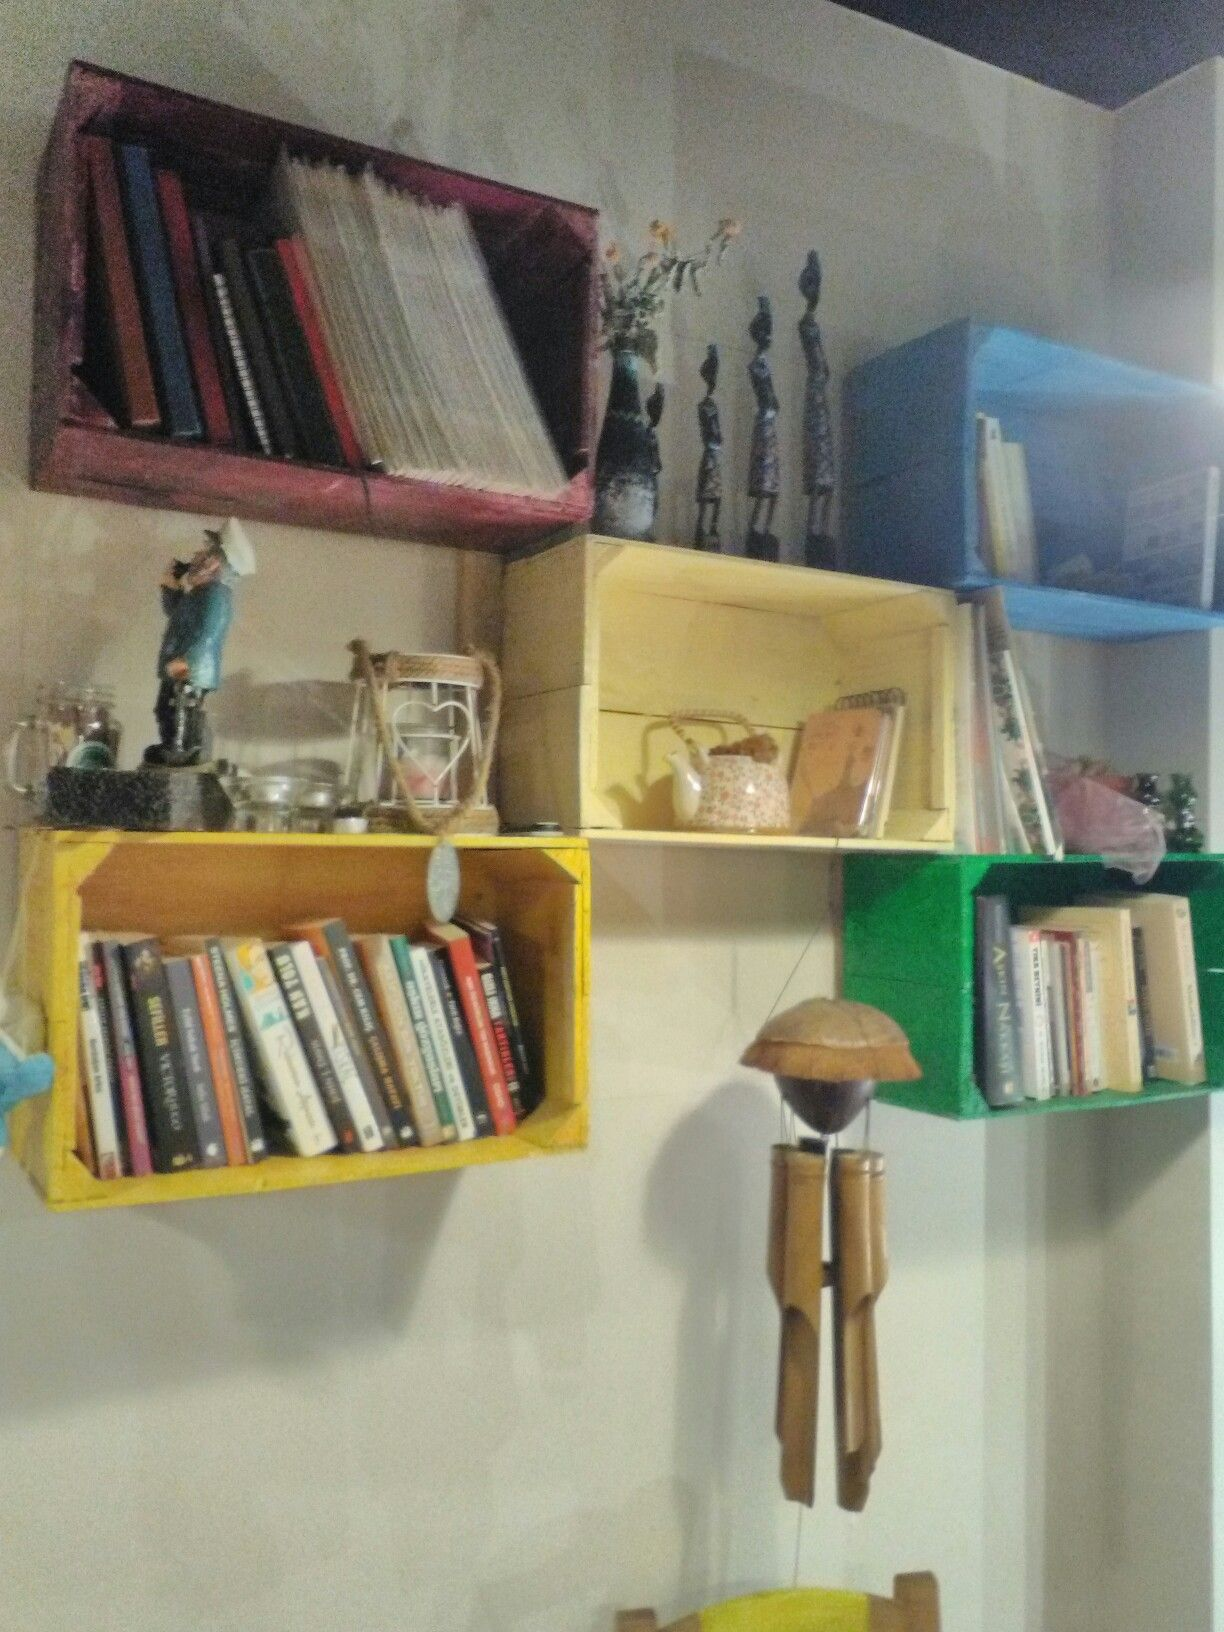 Renkli Kasa Kitaplik Kafe Dekor Cafe Home Decor Decor